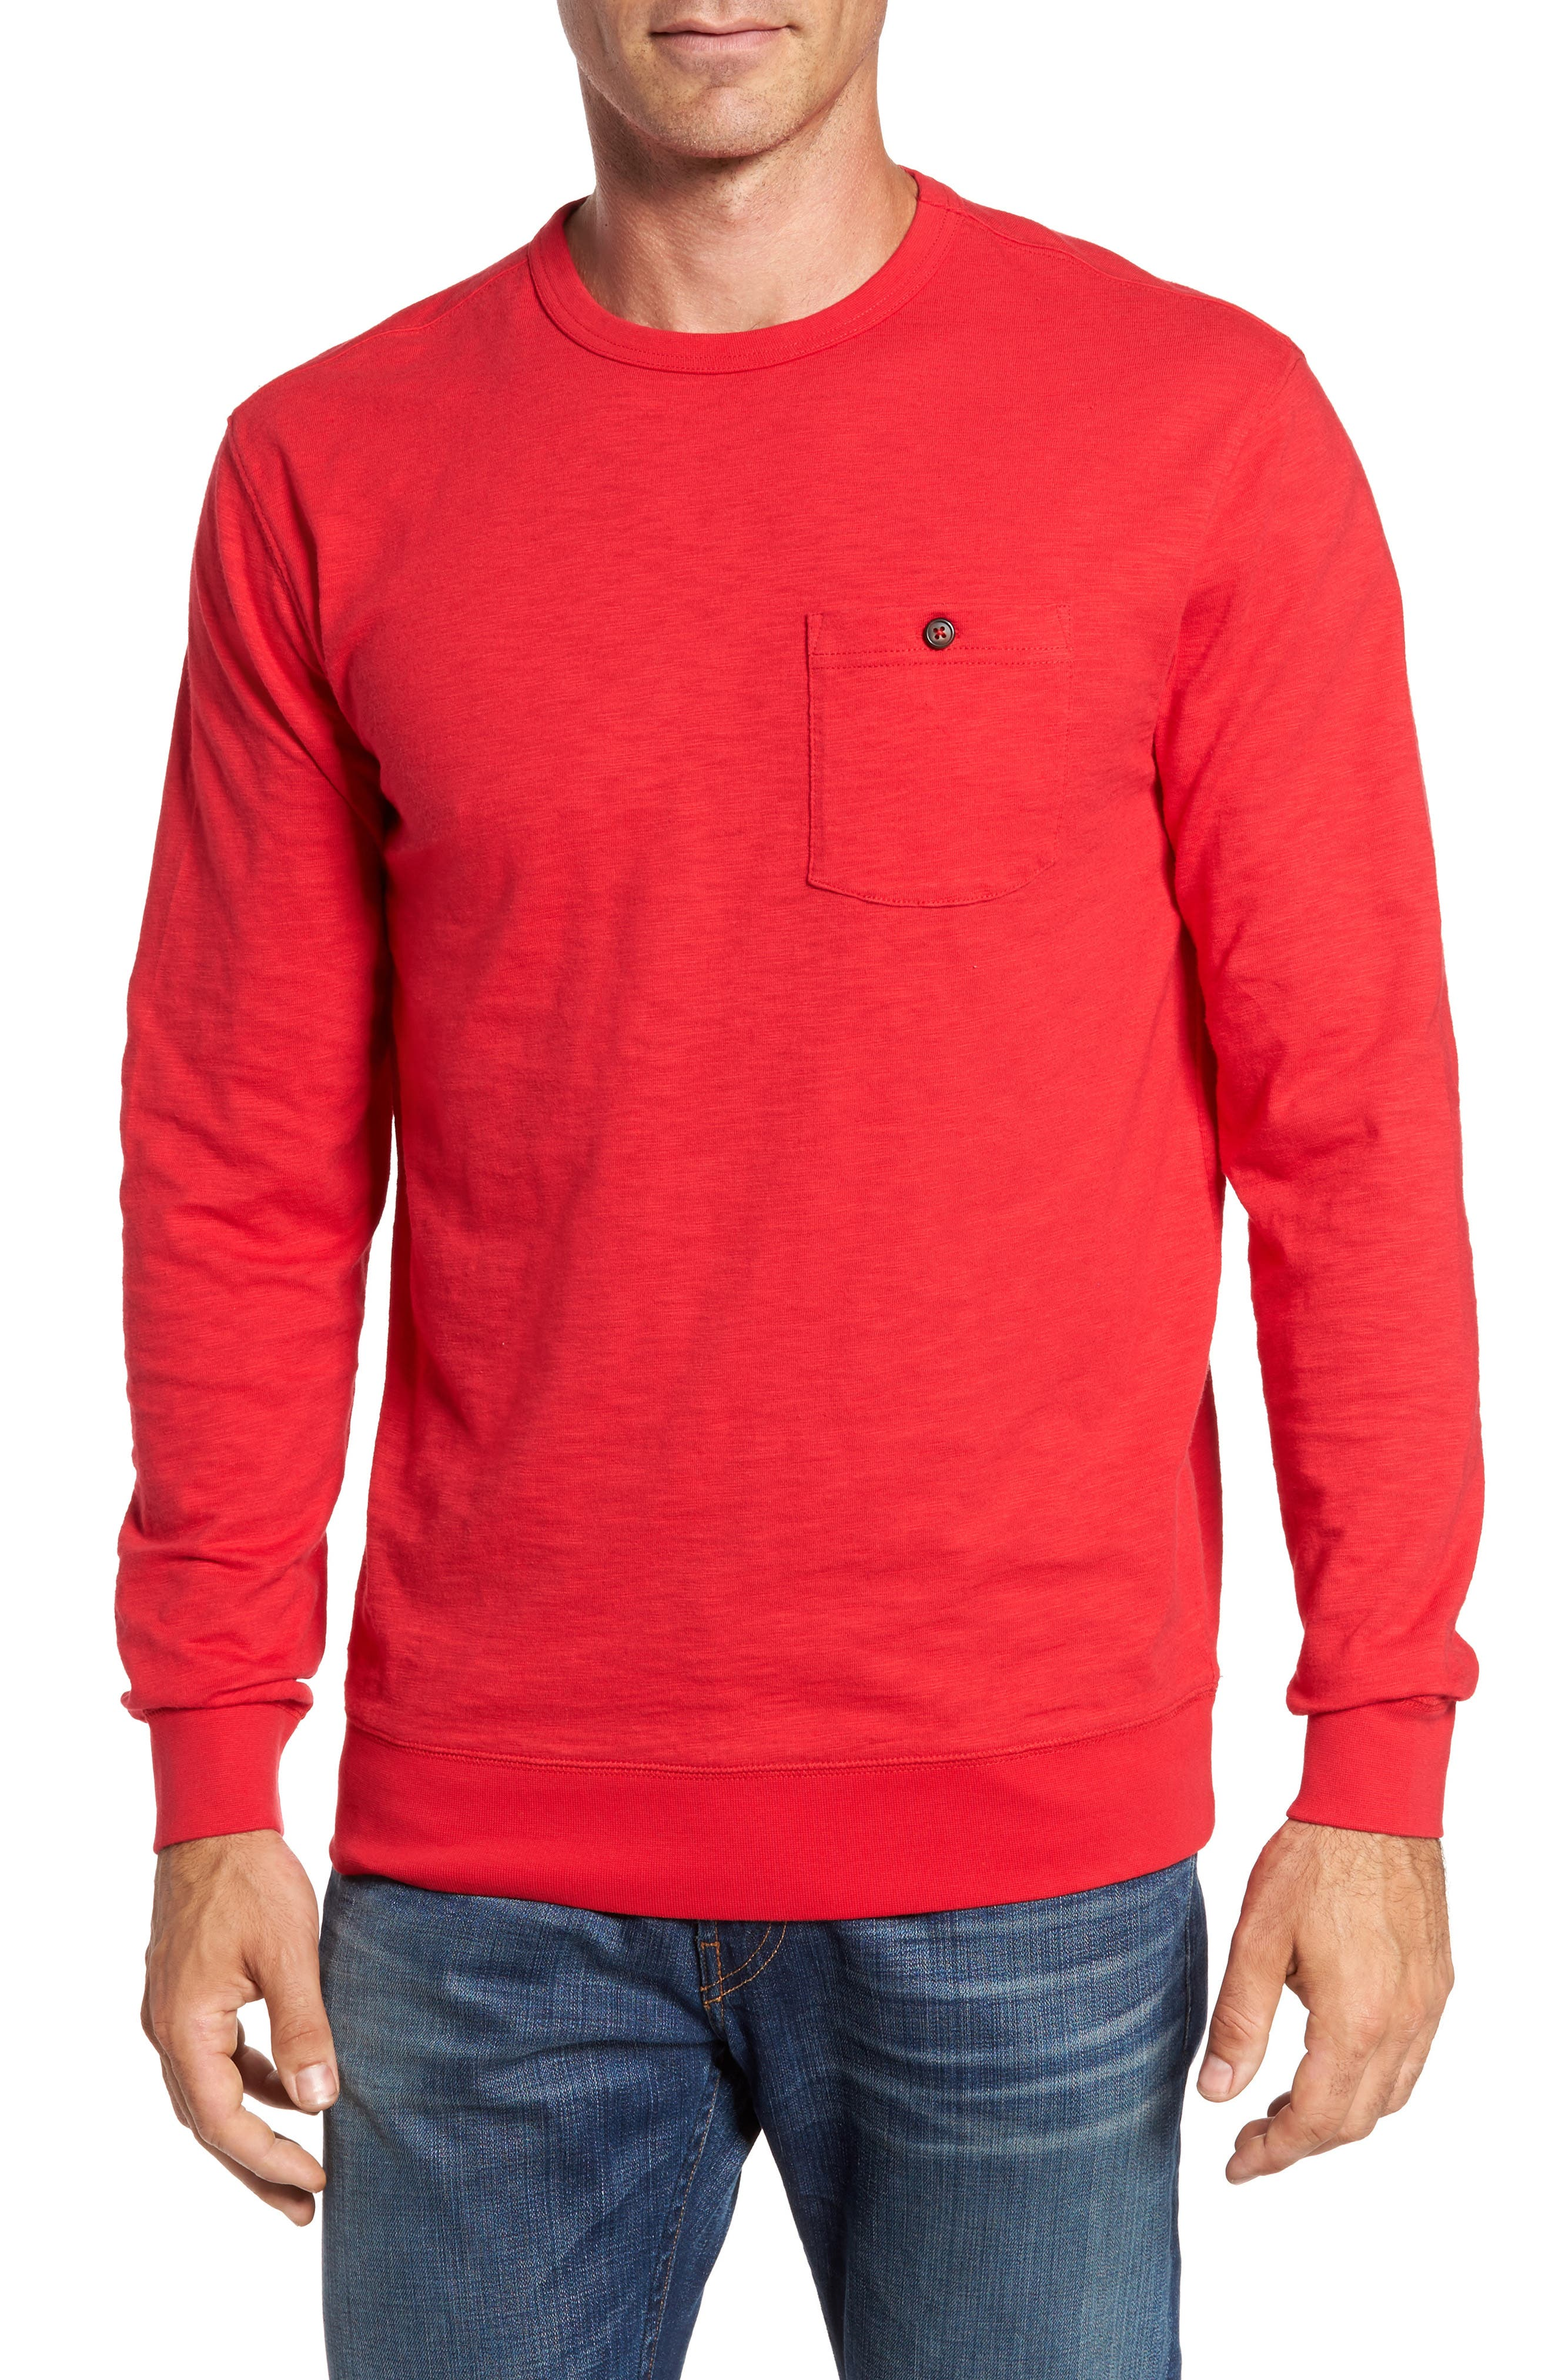 Main Image - Southern Tide Montford Slub Pocket T-Shirt